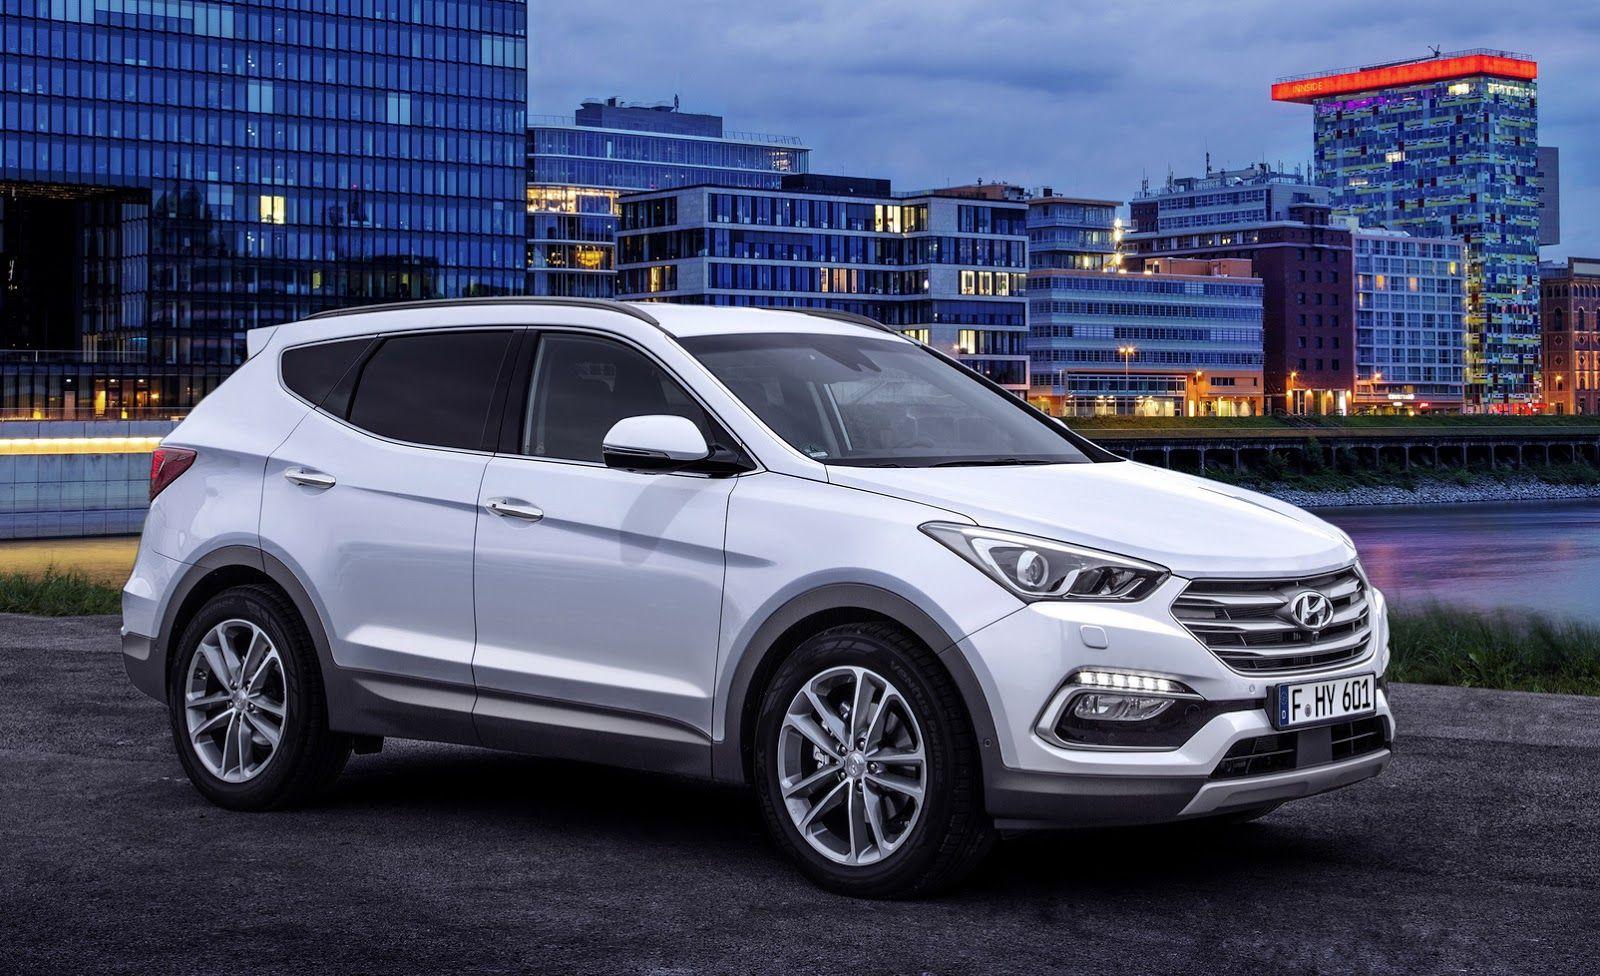 Facelifted 2017 Hyundai Santa Fe Unveiled Debuts In Frankfurt Carscoops Hyundai Santa Fe Sport Hyundai Santa Fe Hyundai Cars